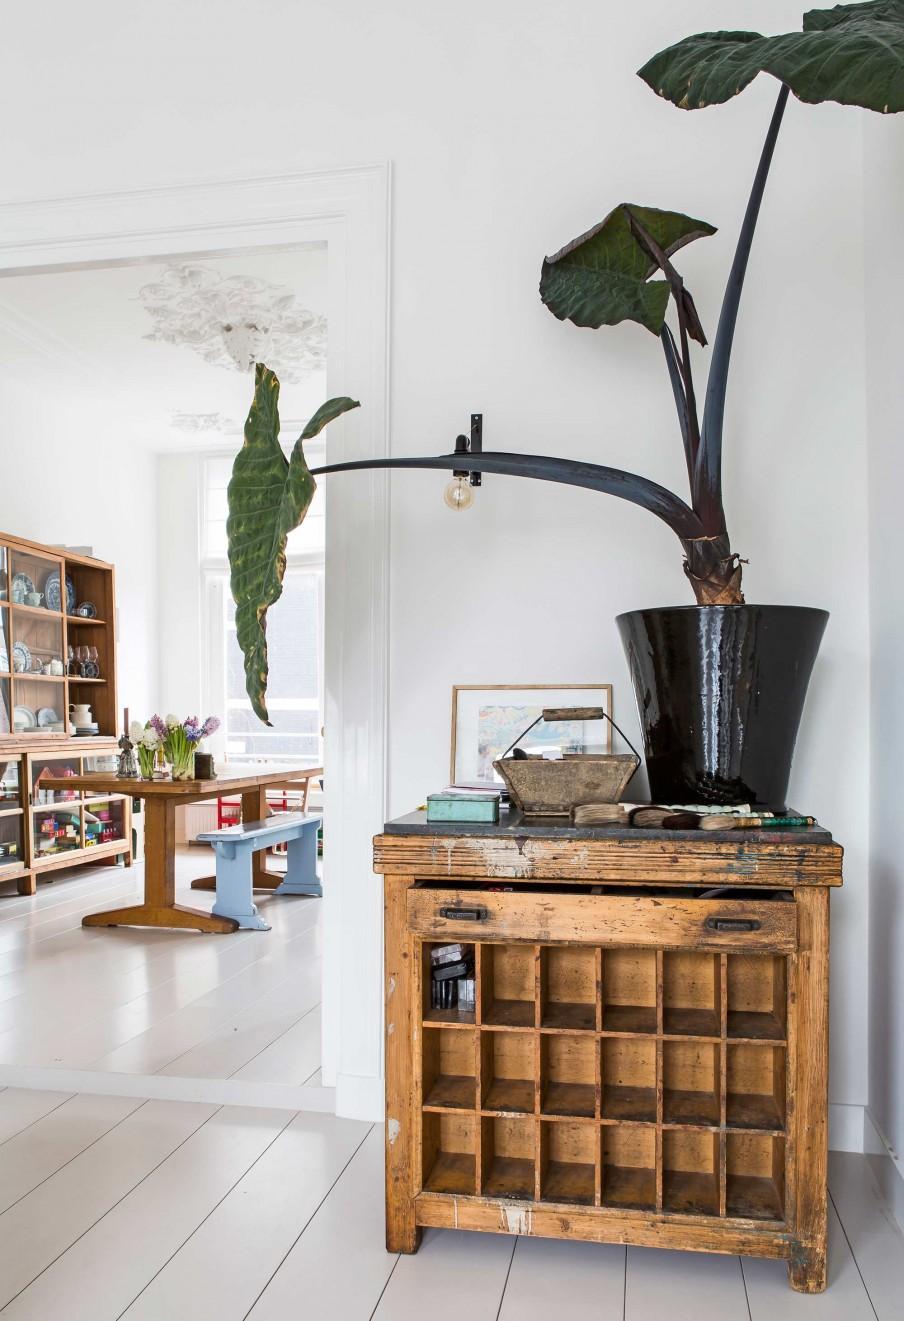 une maison de 1900 amsterdam lili in wonderland. Black Bedroom Furniture Sets. Home Design Ideas